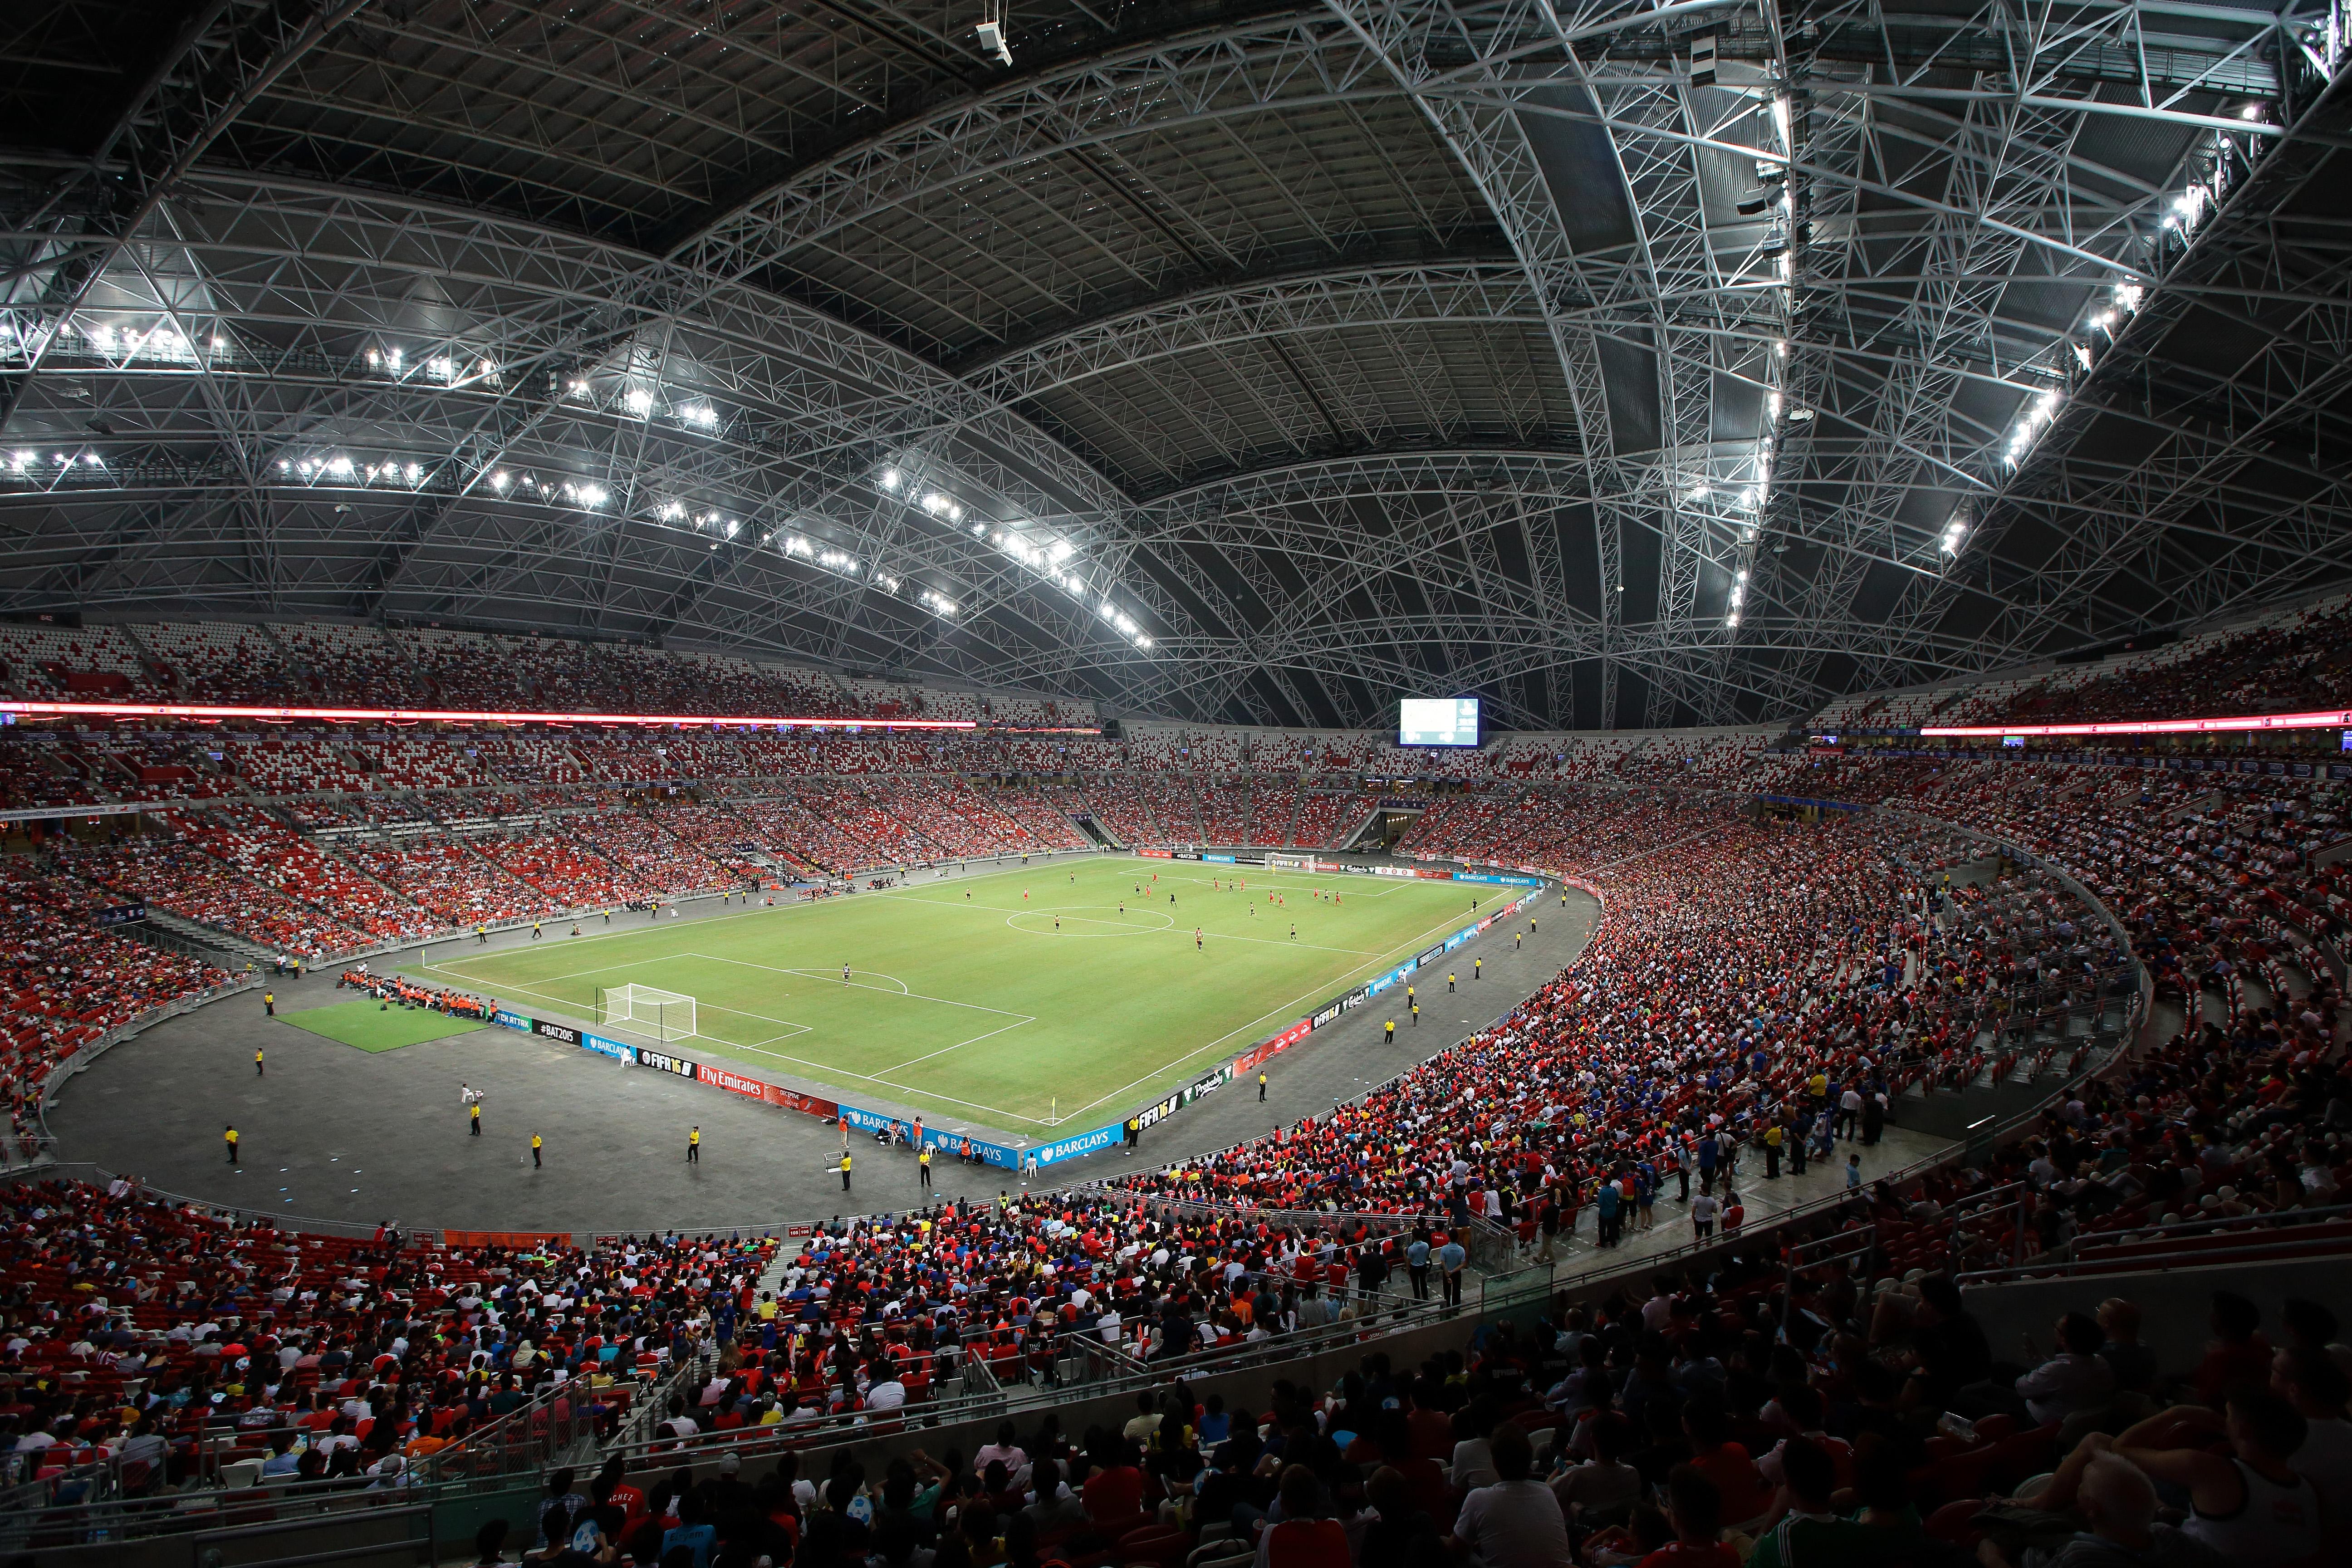 National Stadium Singapore